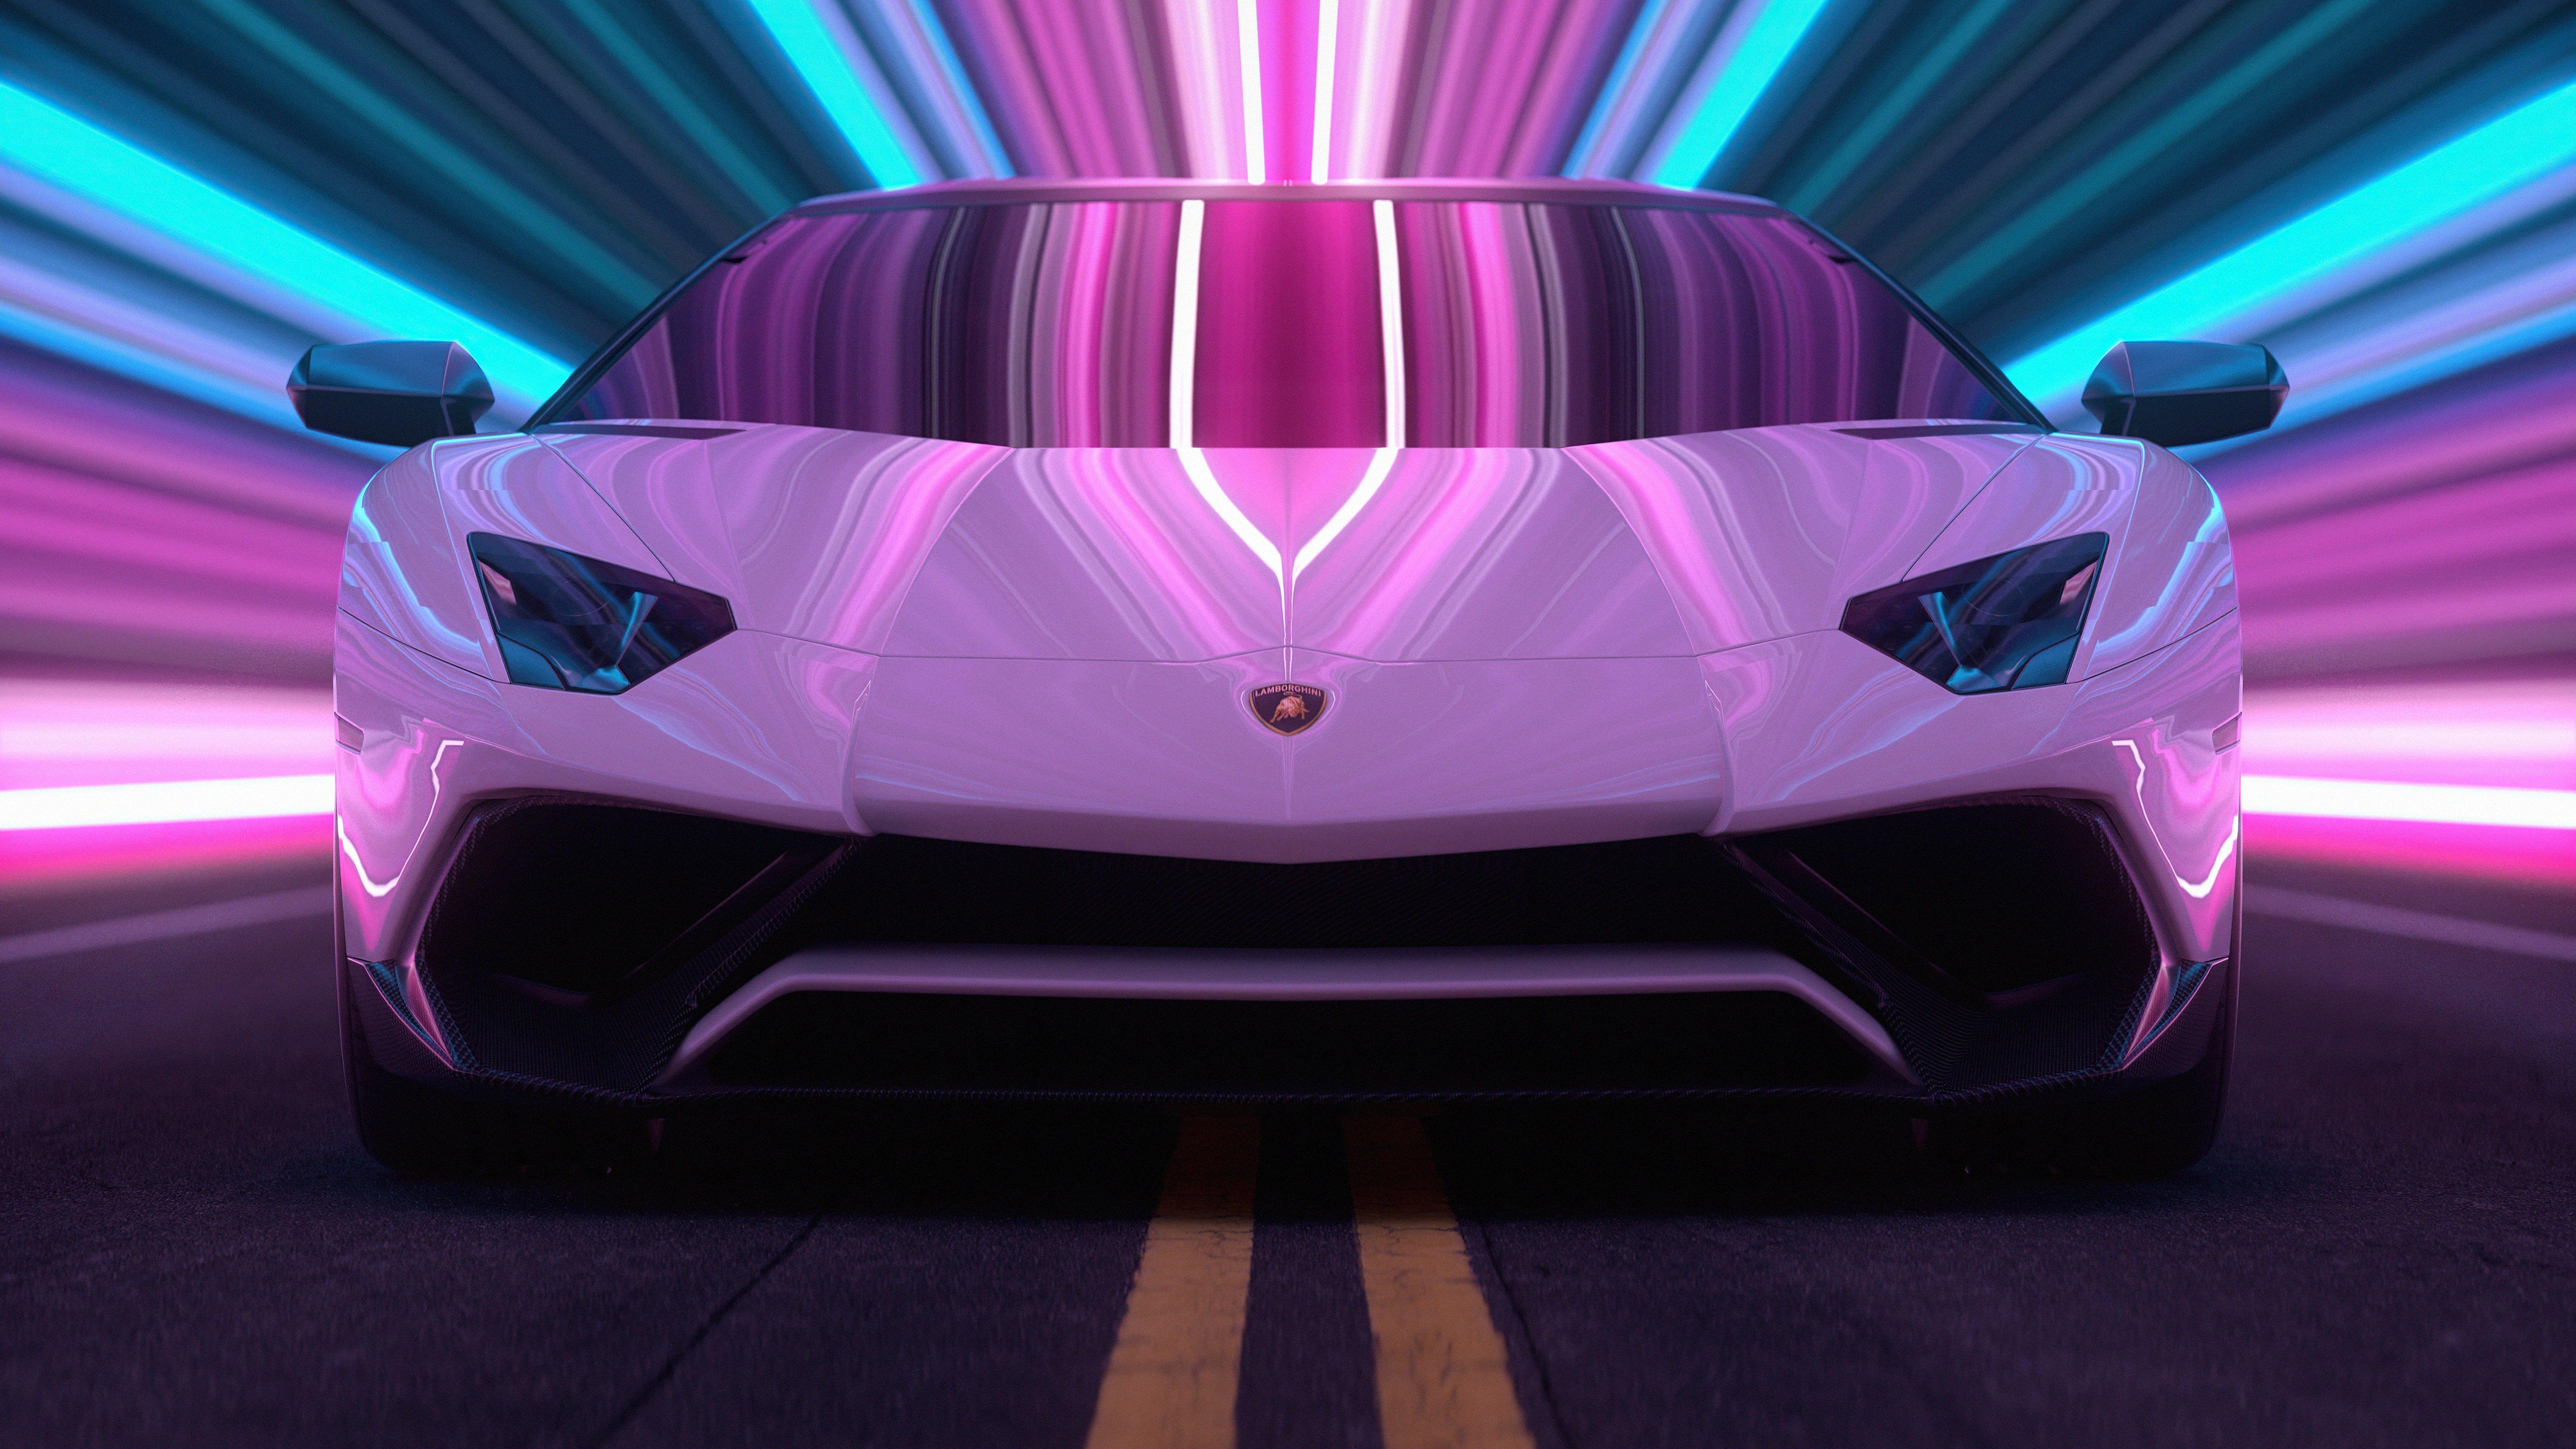 Fondos de pantalla Lamborghini Aventador CGI